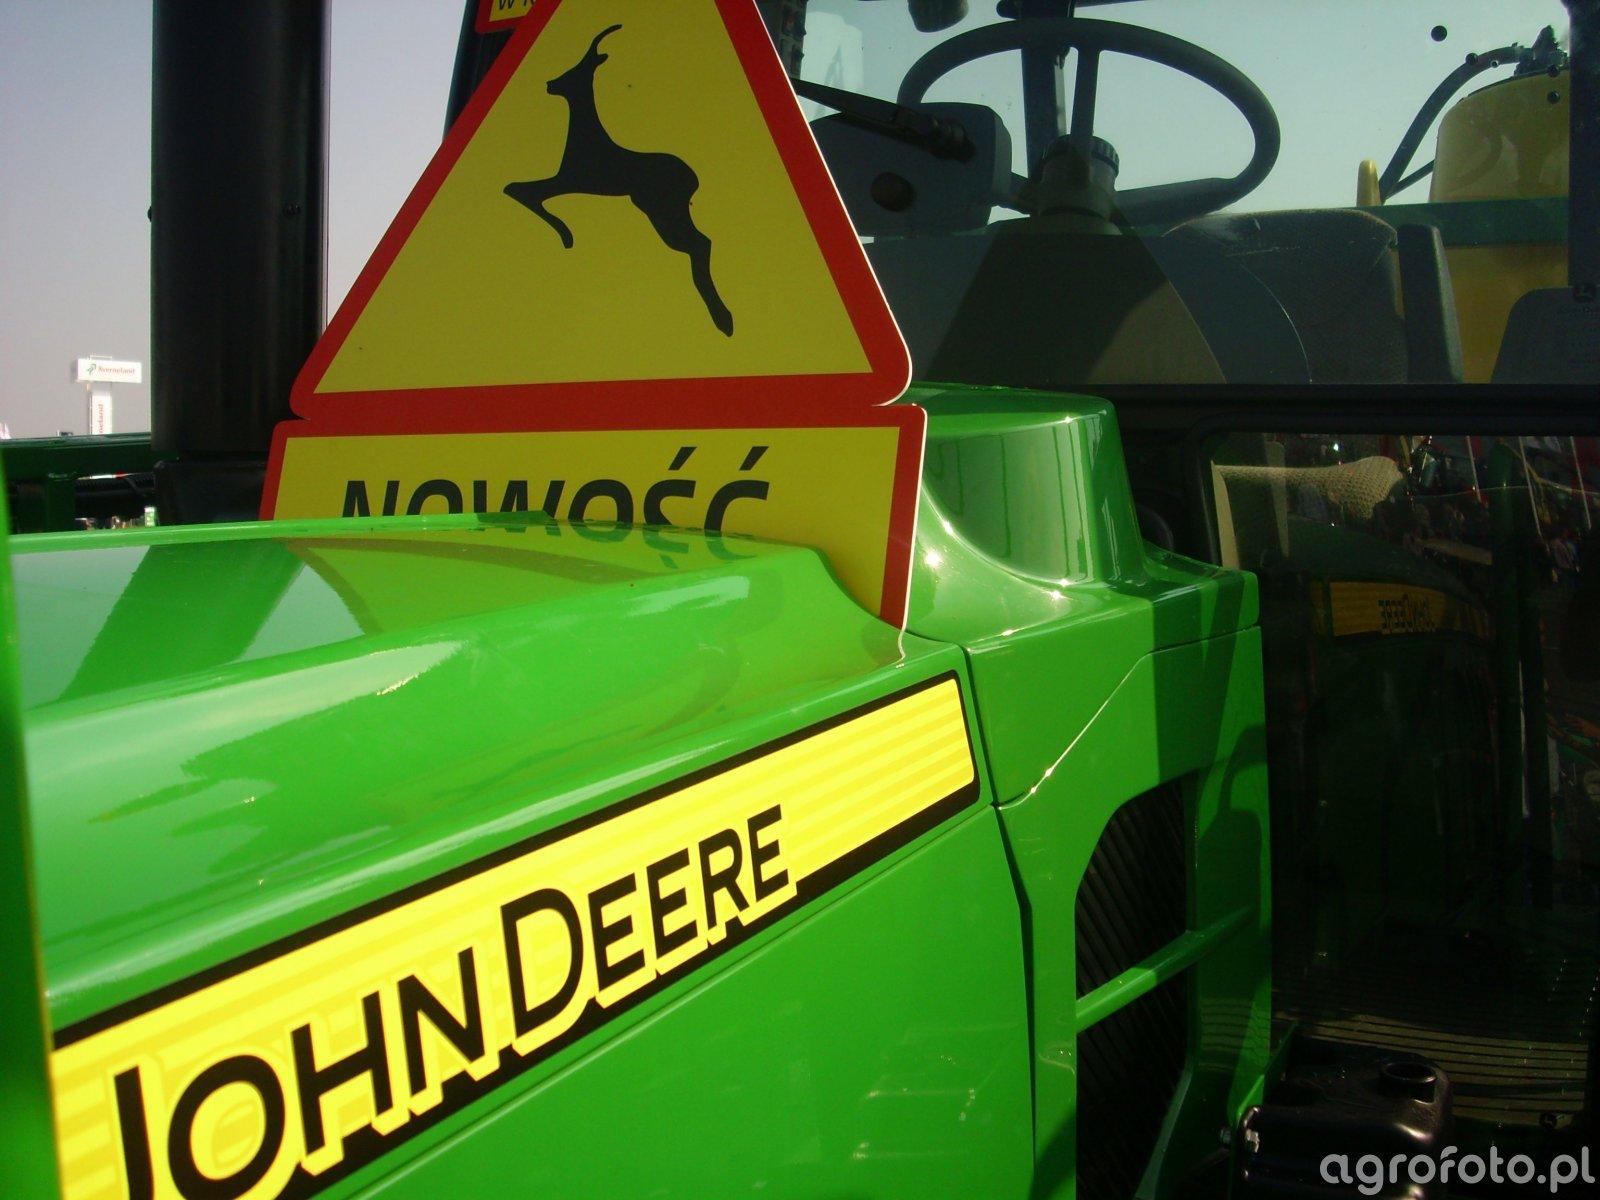 John Deere :)